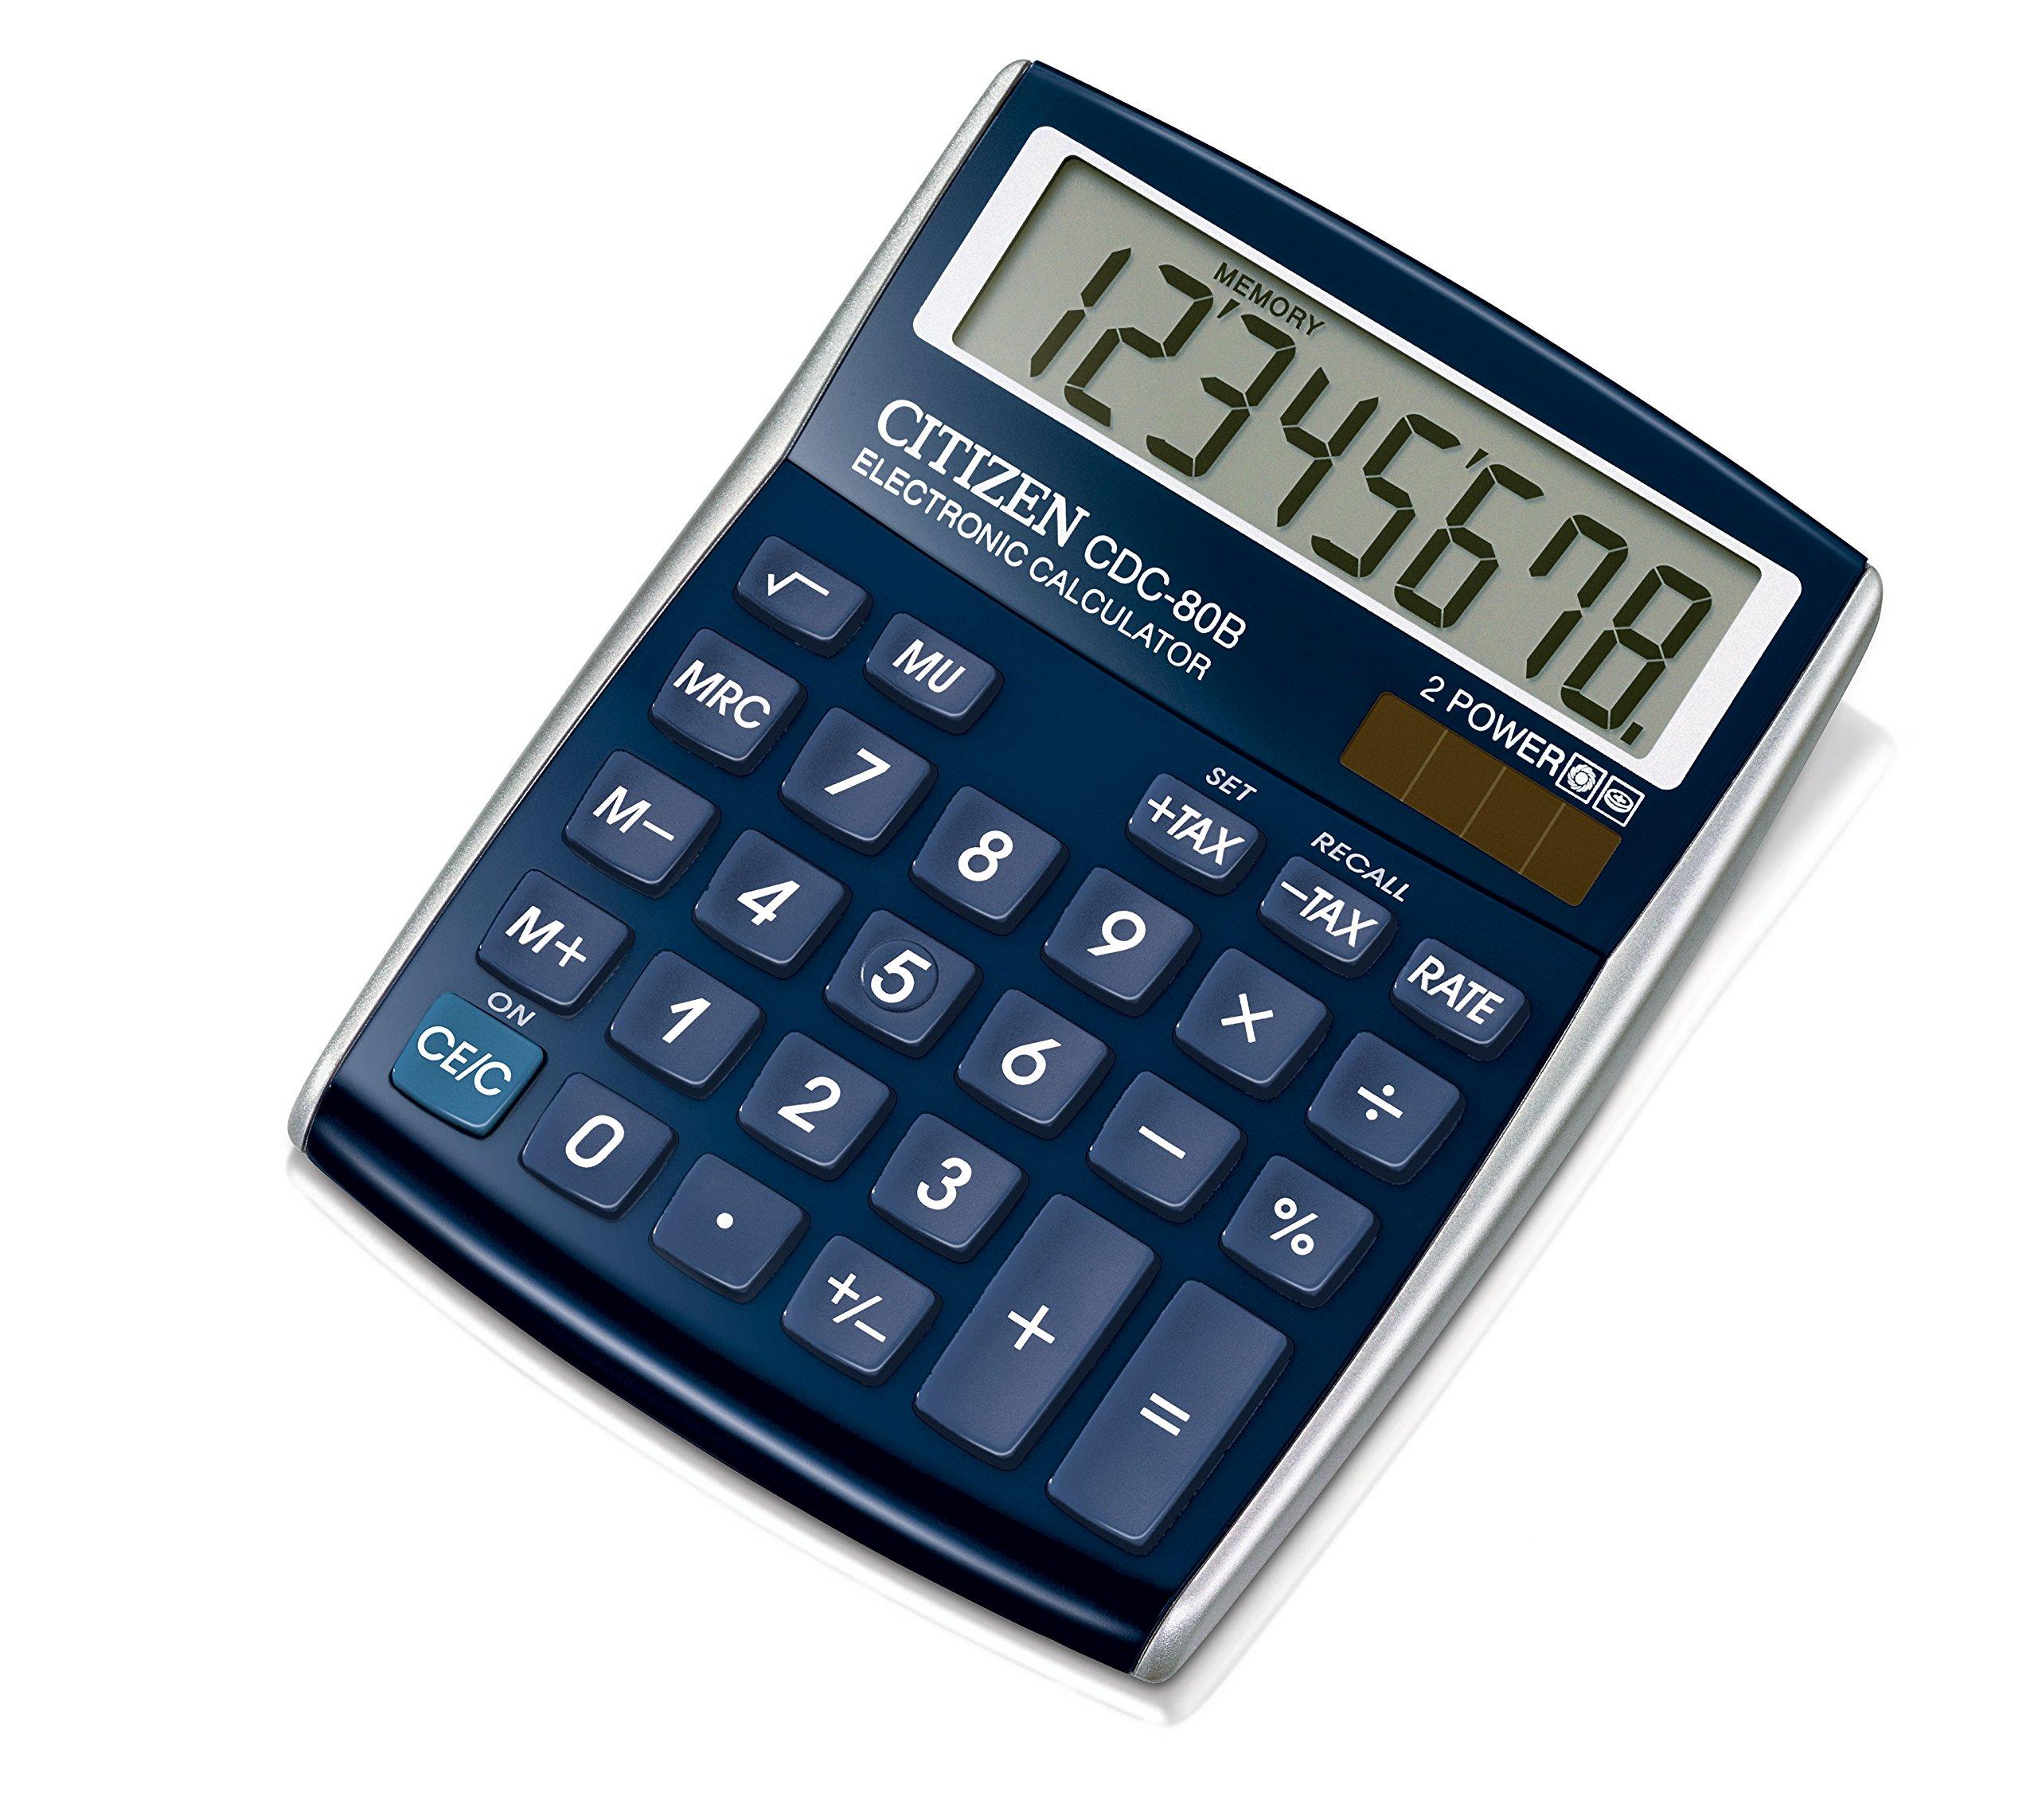 CITIZEN CDC80 Designline 108 x 135 x 24 mm Desktop Calculator - Blue